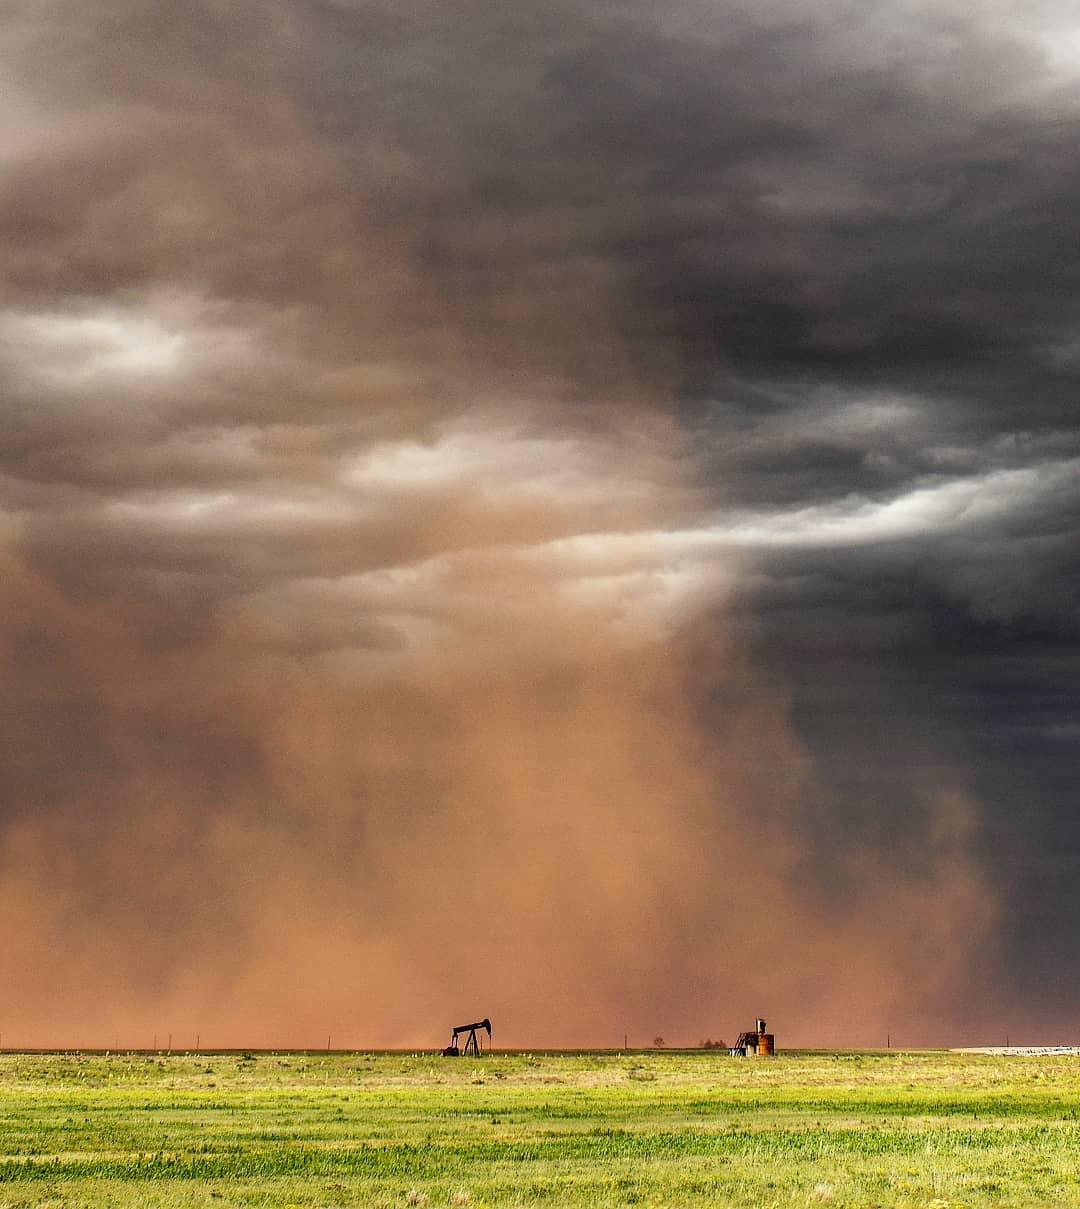 Грег Джонсон - охотник за штормами и торнадо